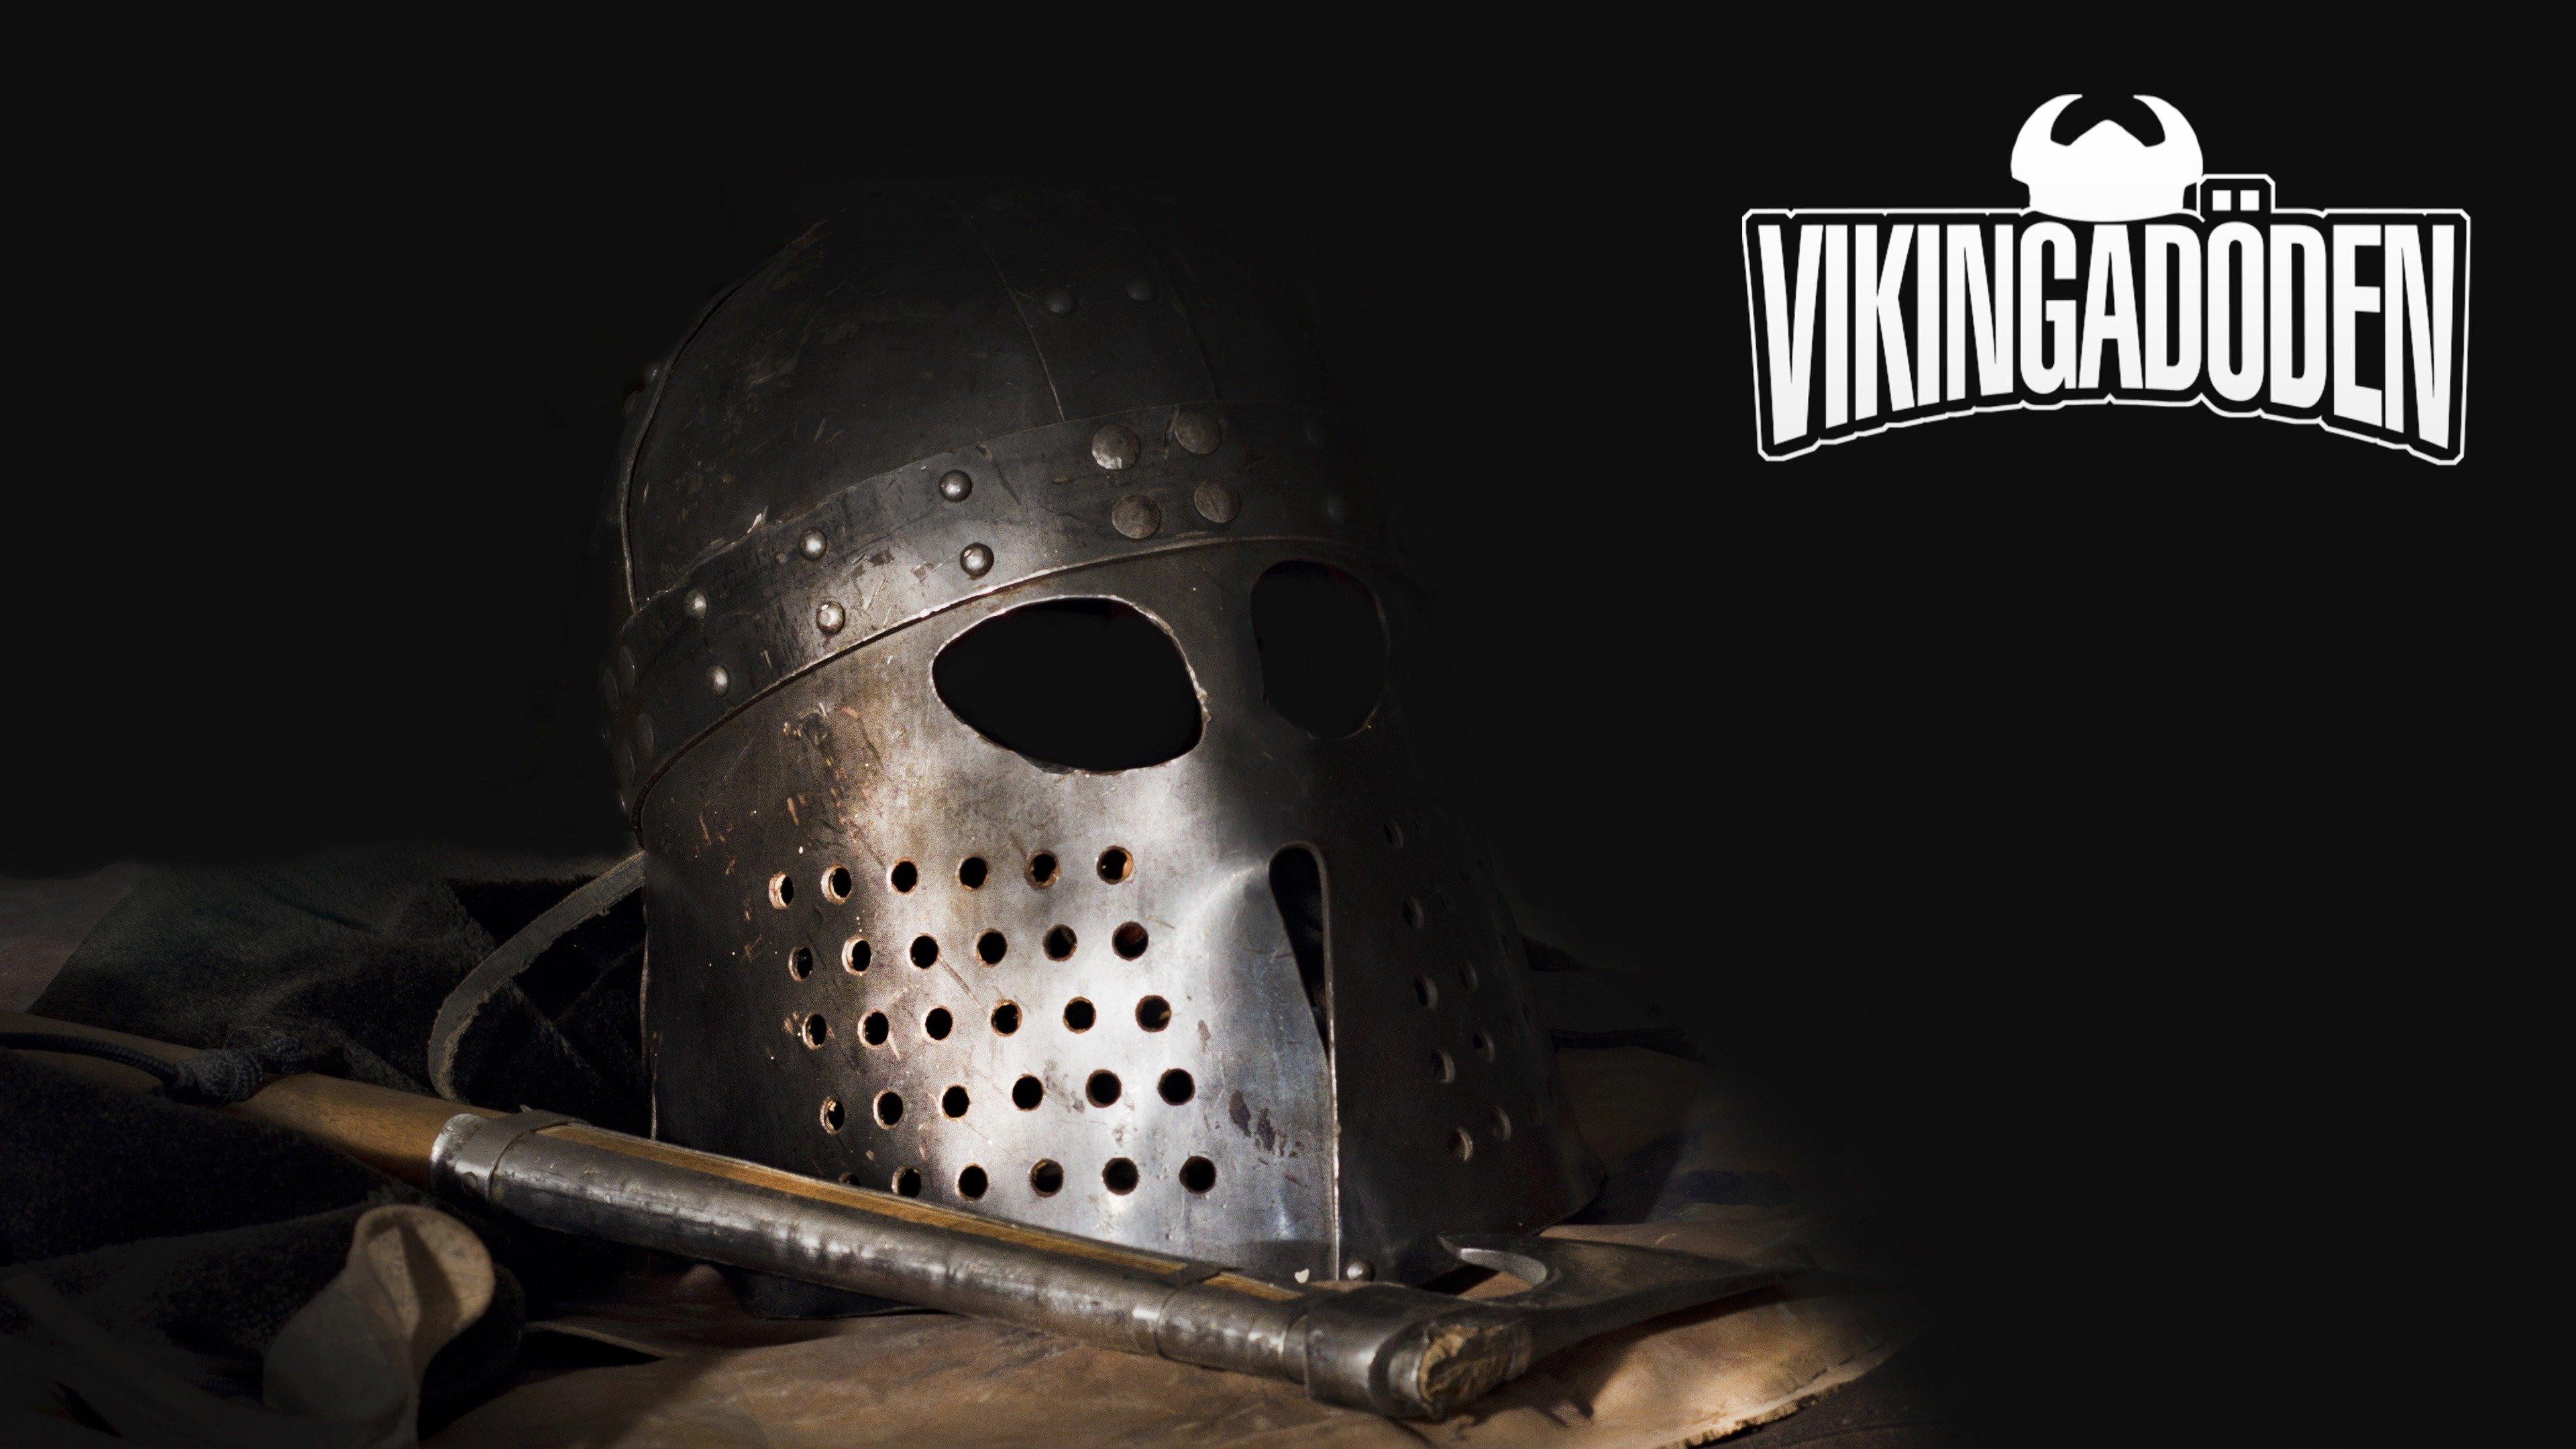 Vikingadöden